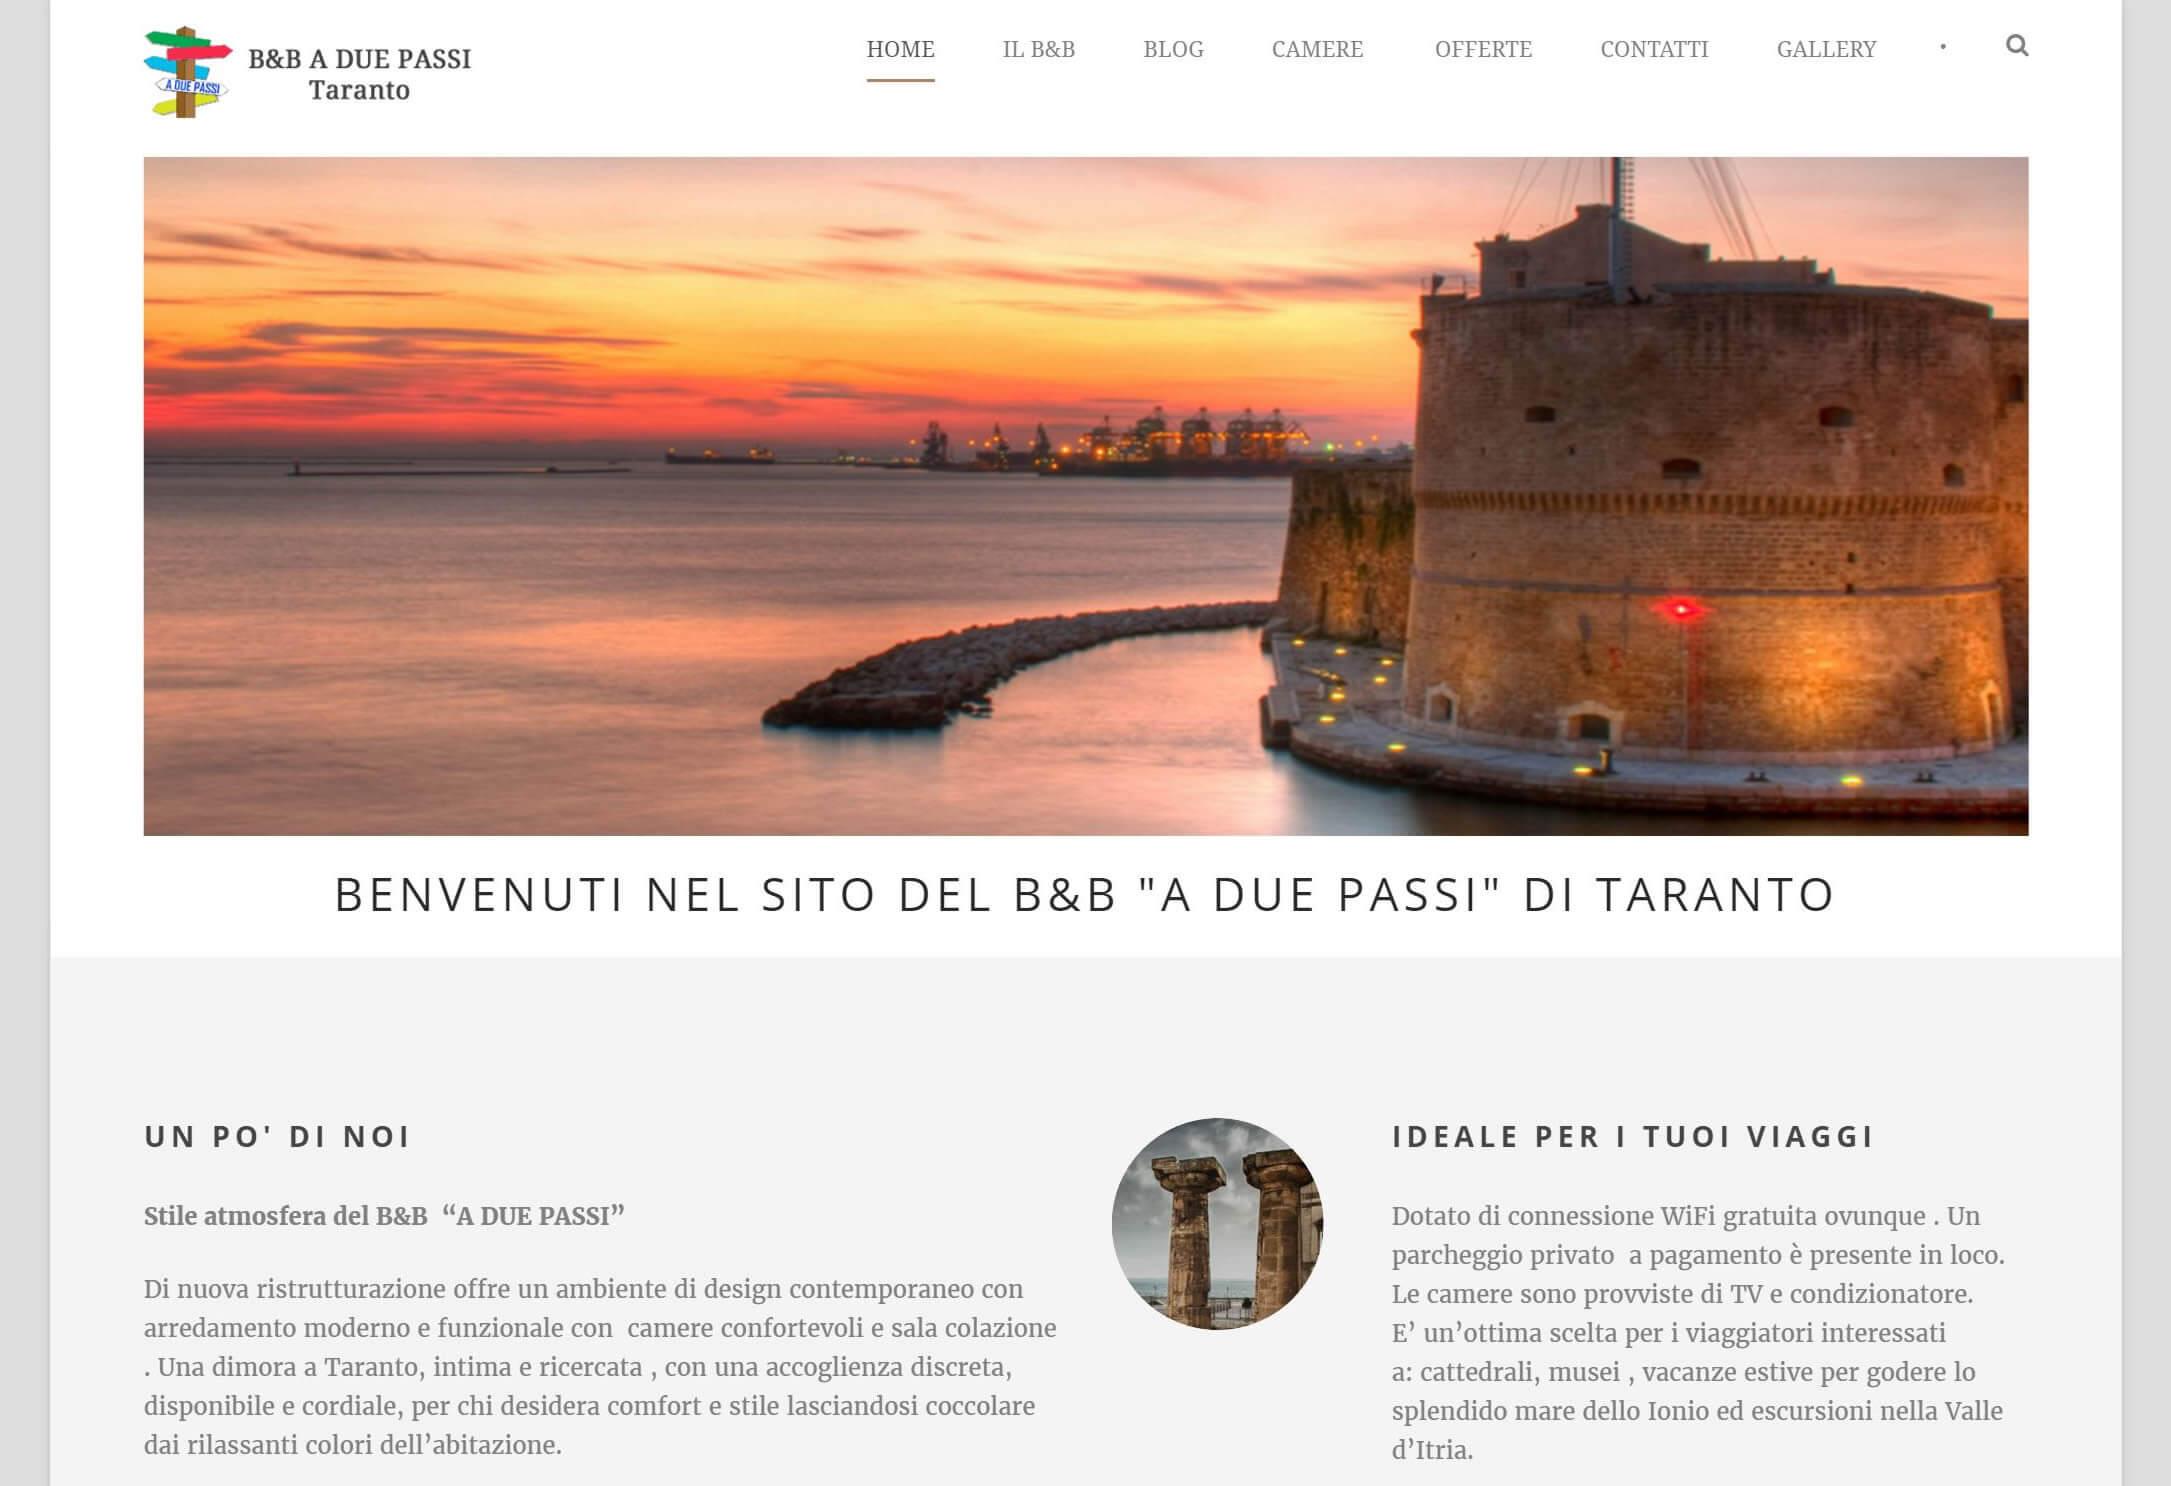 B&B a due passi Taranto